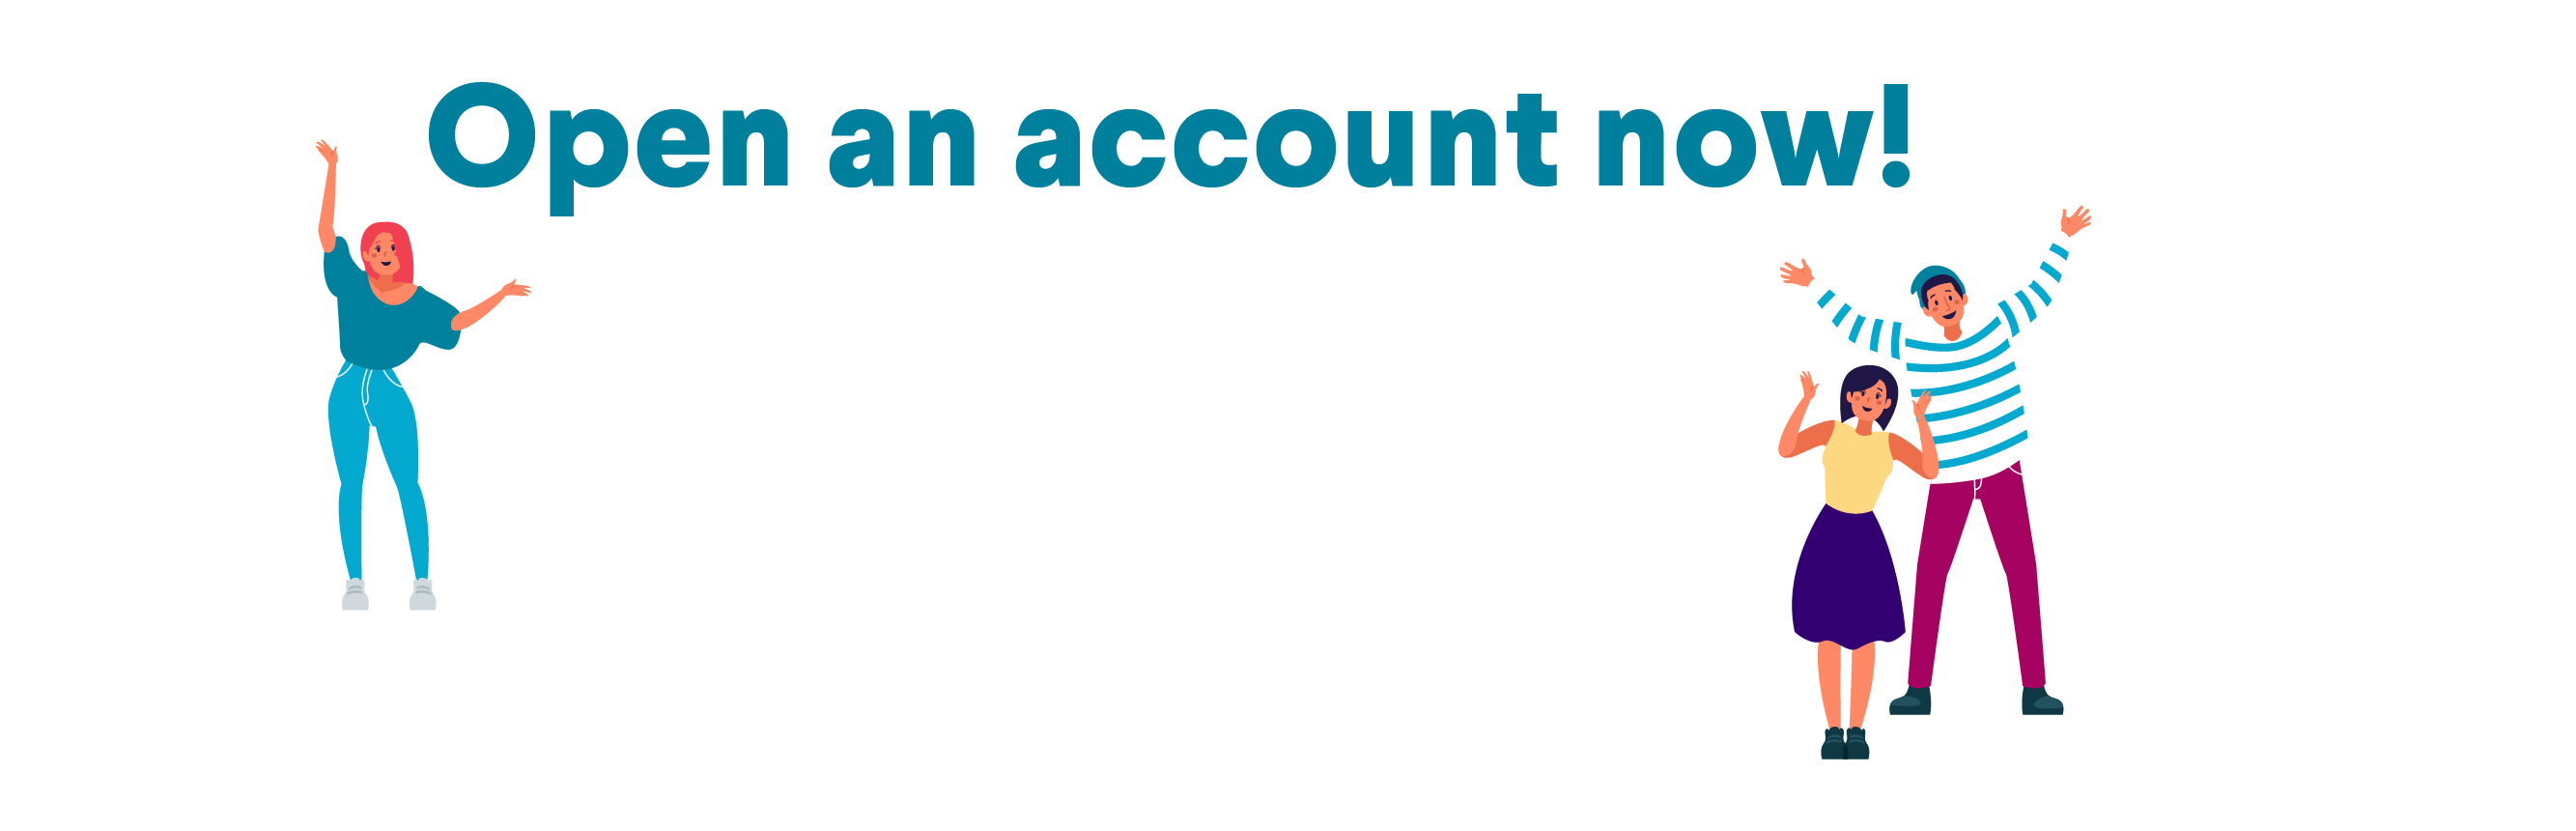 sofi open account